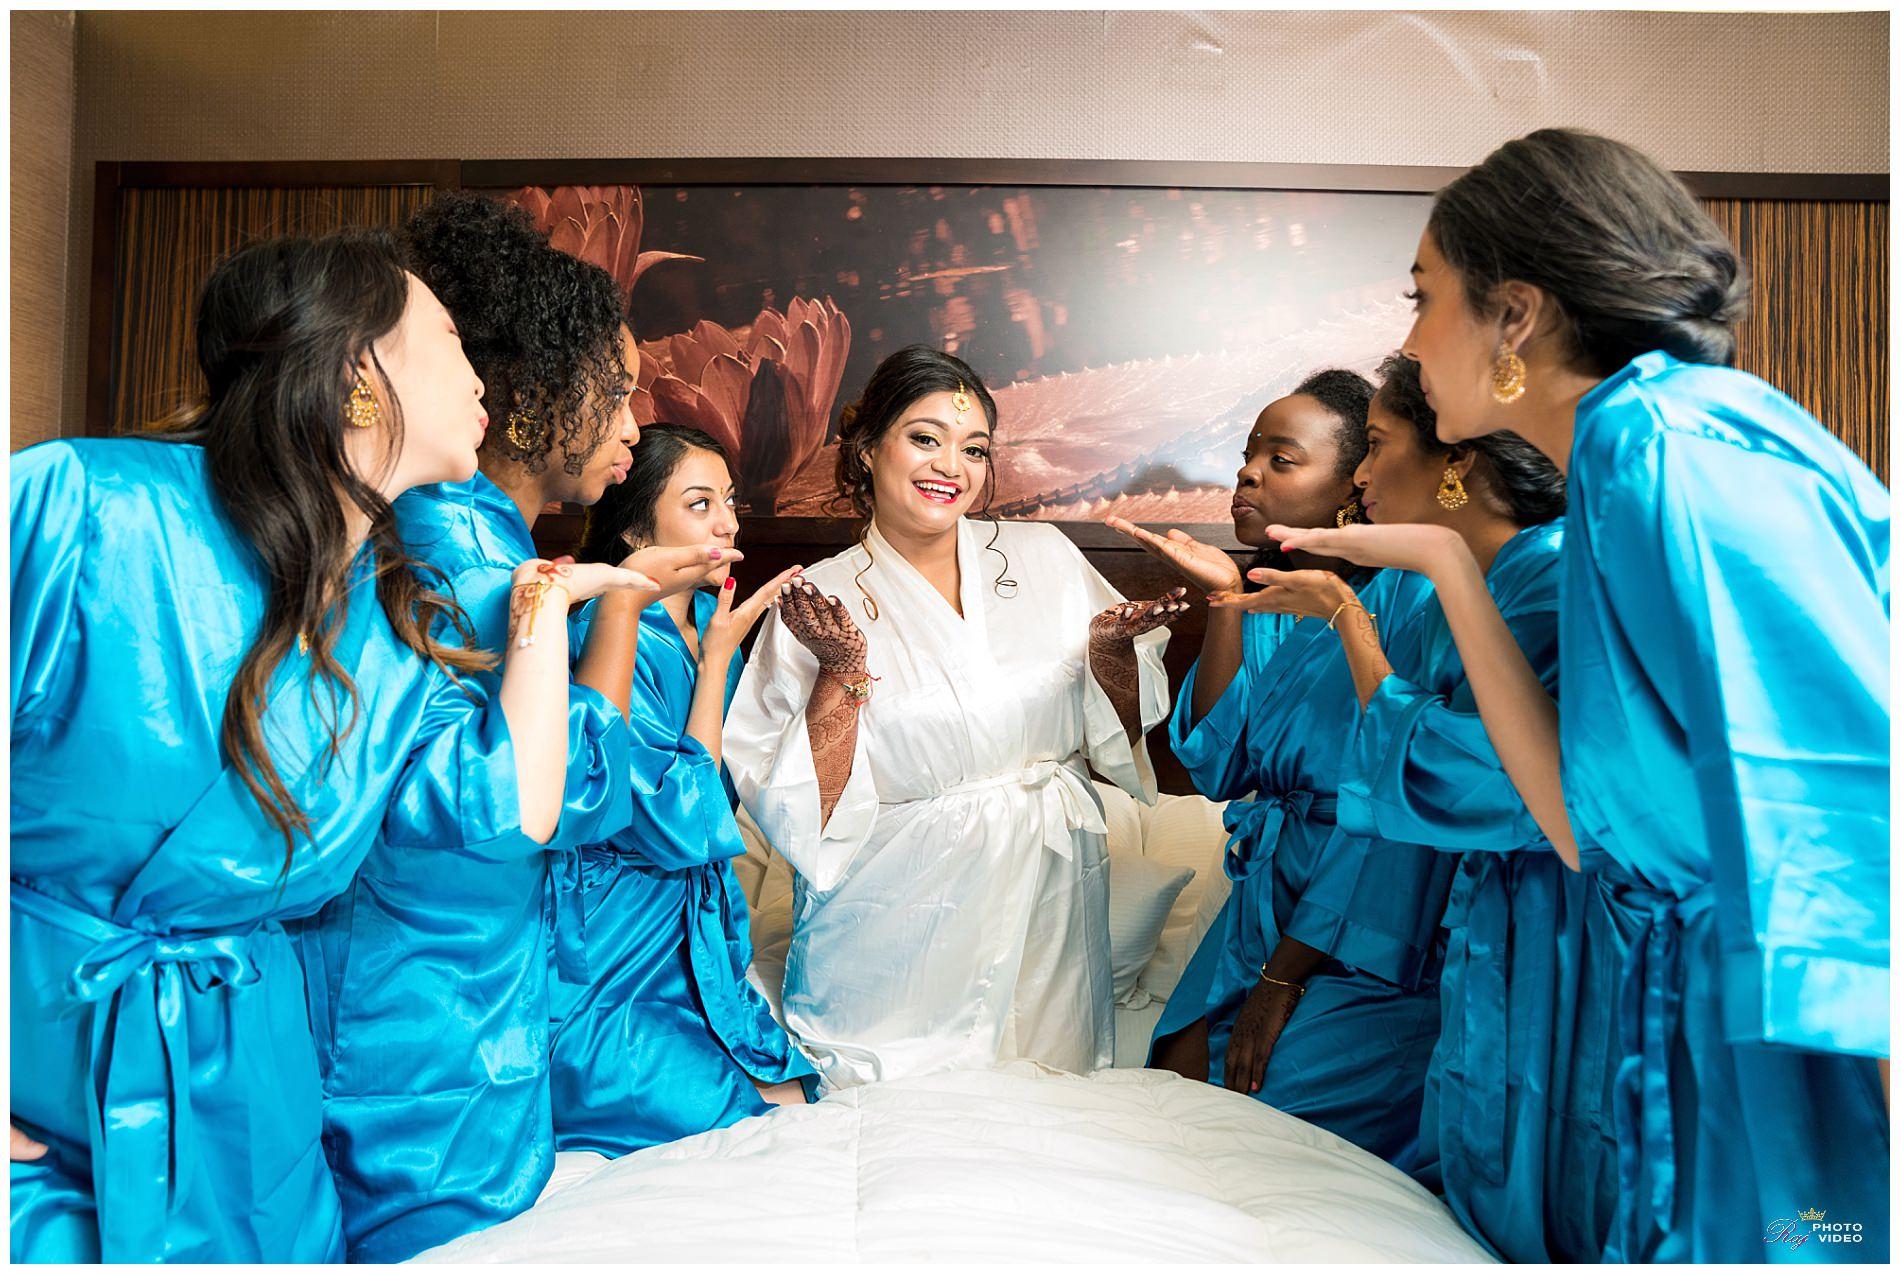 doubletree-by-hilton-hotel-wilmington-de-wedding-krishna-ritesh-20.jpg